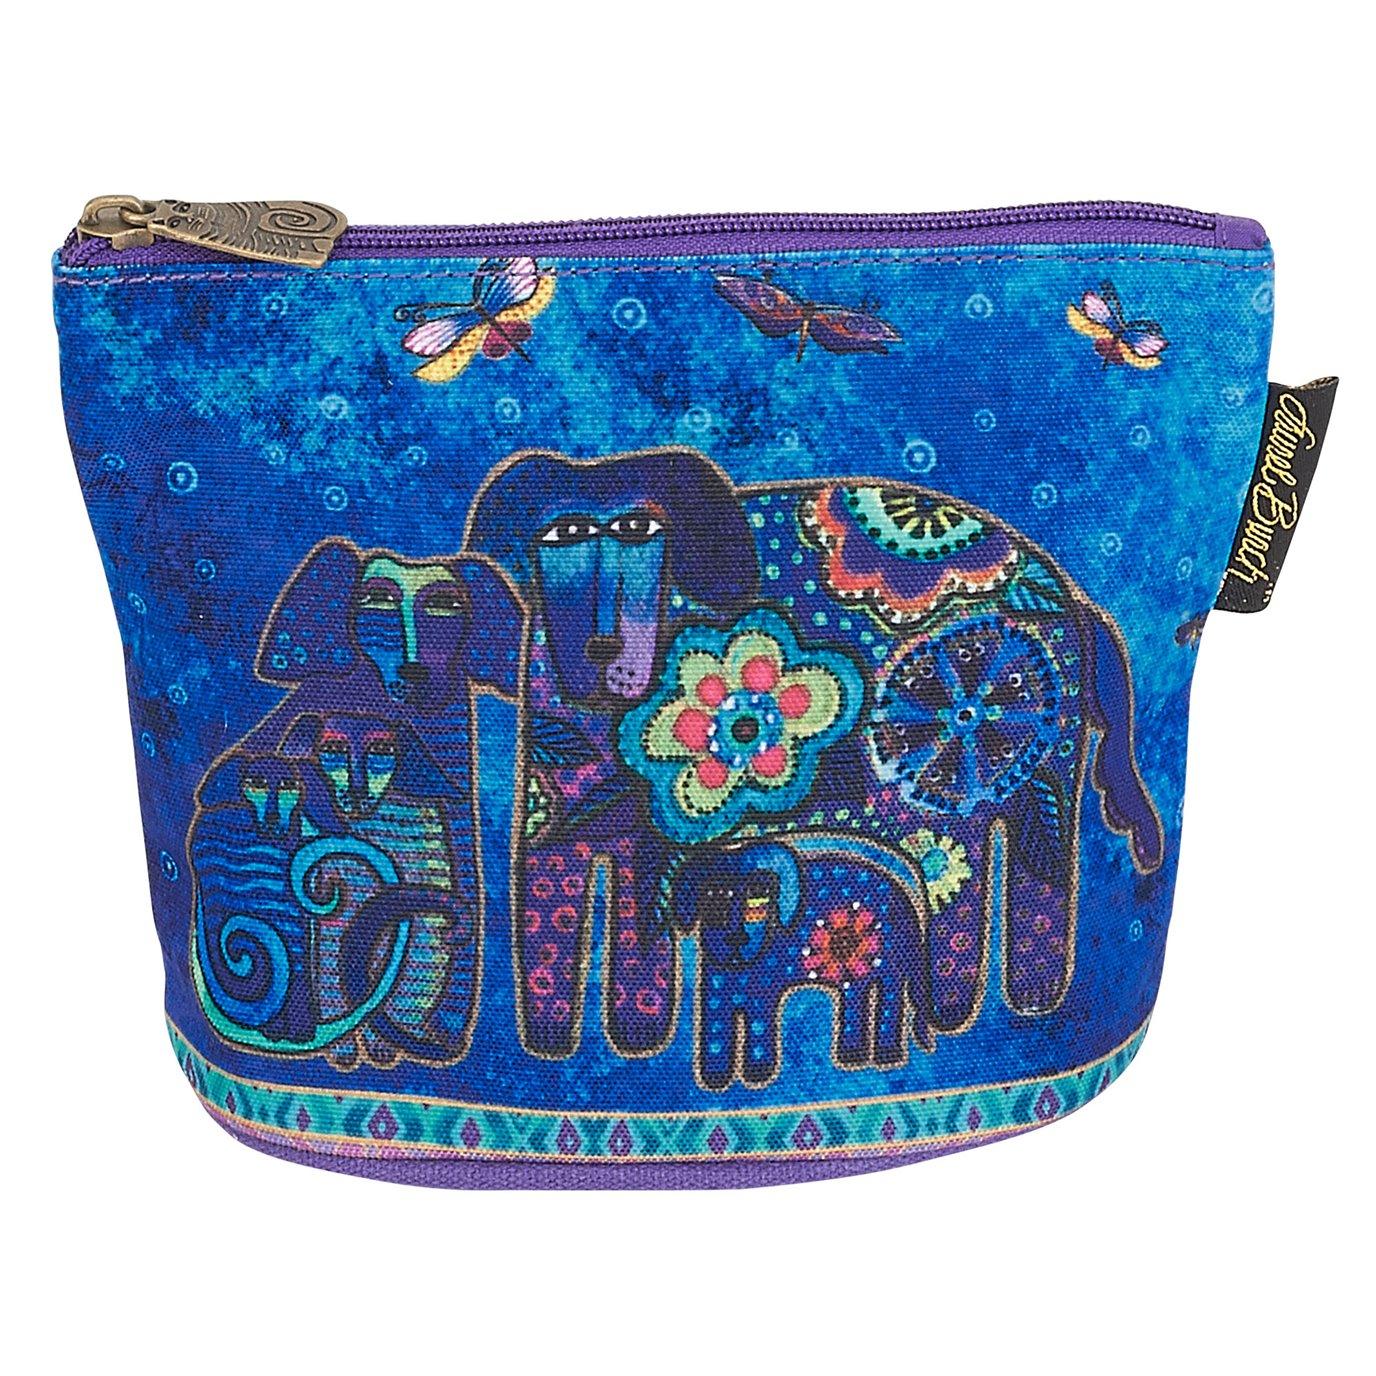 Laurel Burch Canine Friends Mini Cosmetic Bag - royal blue